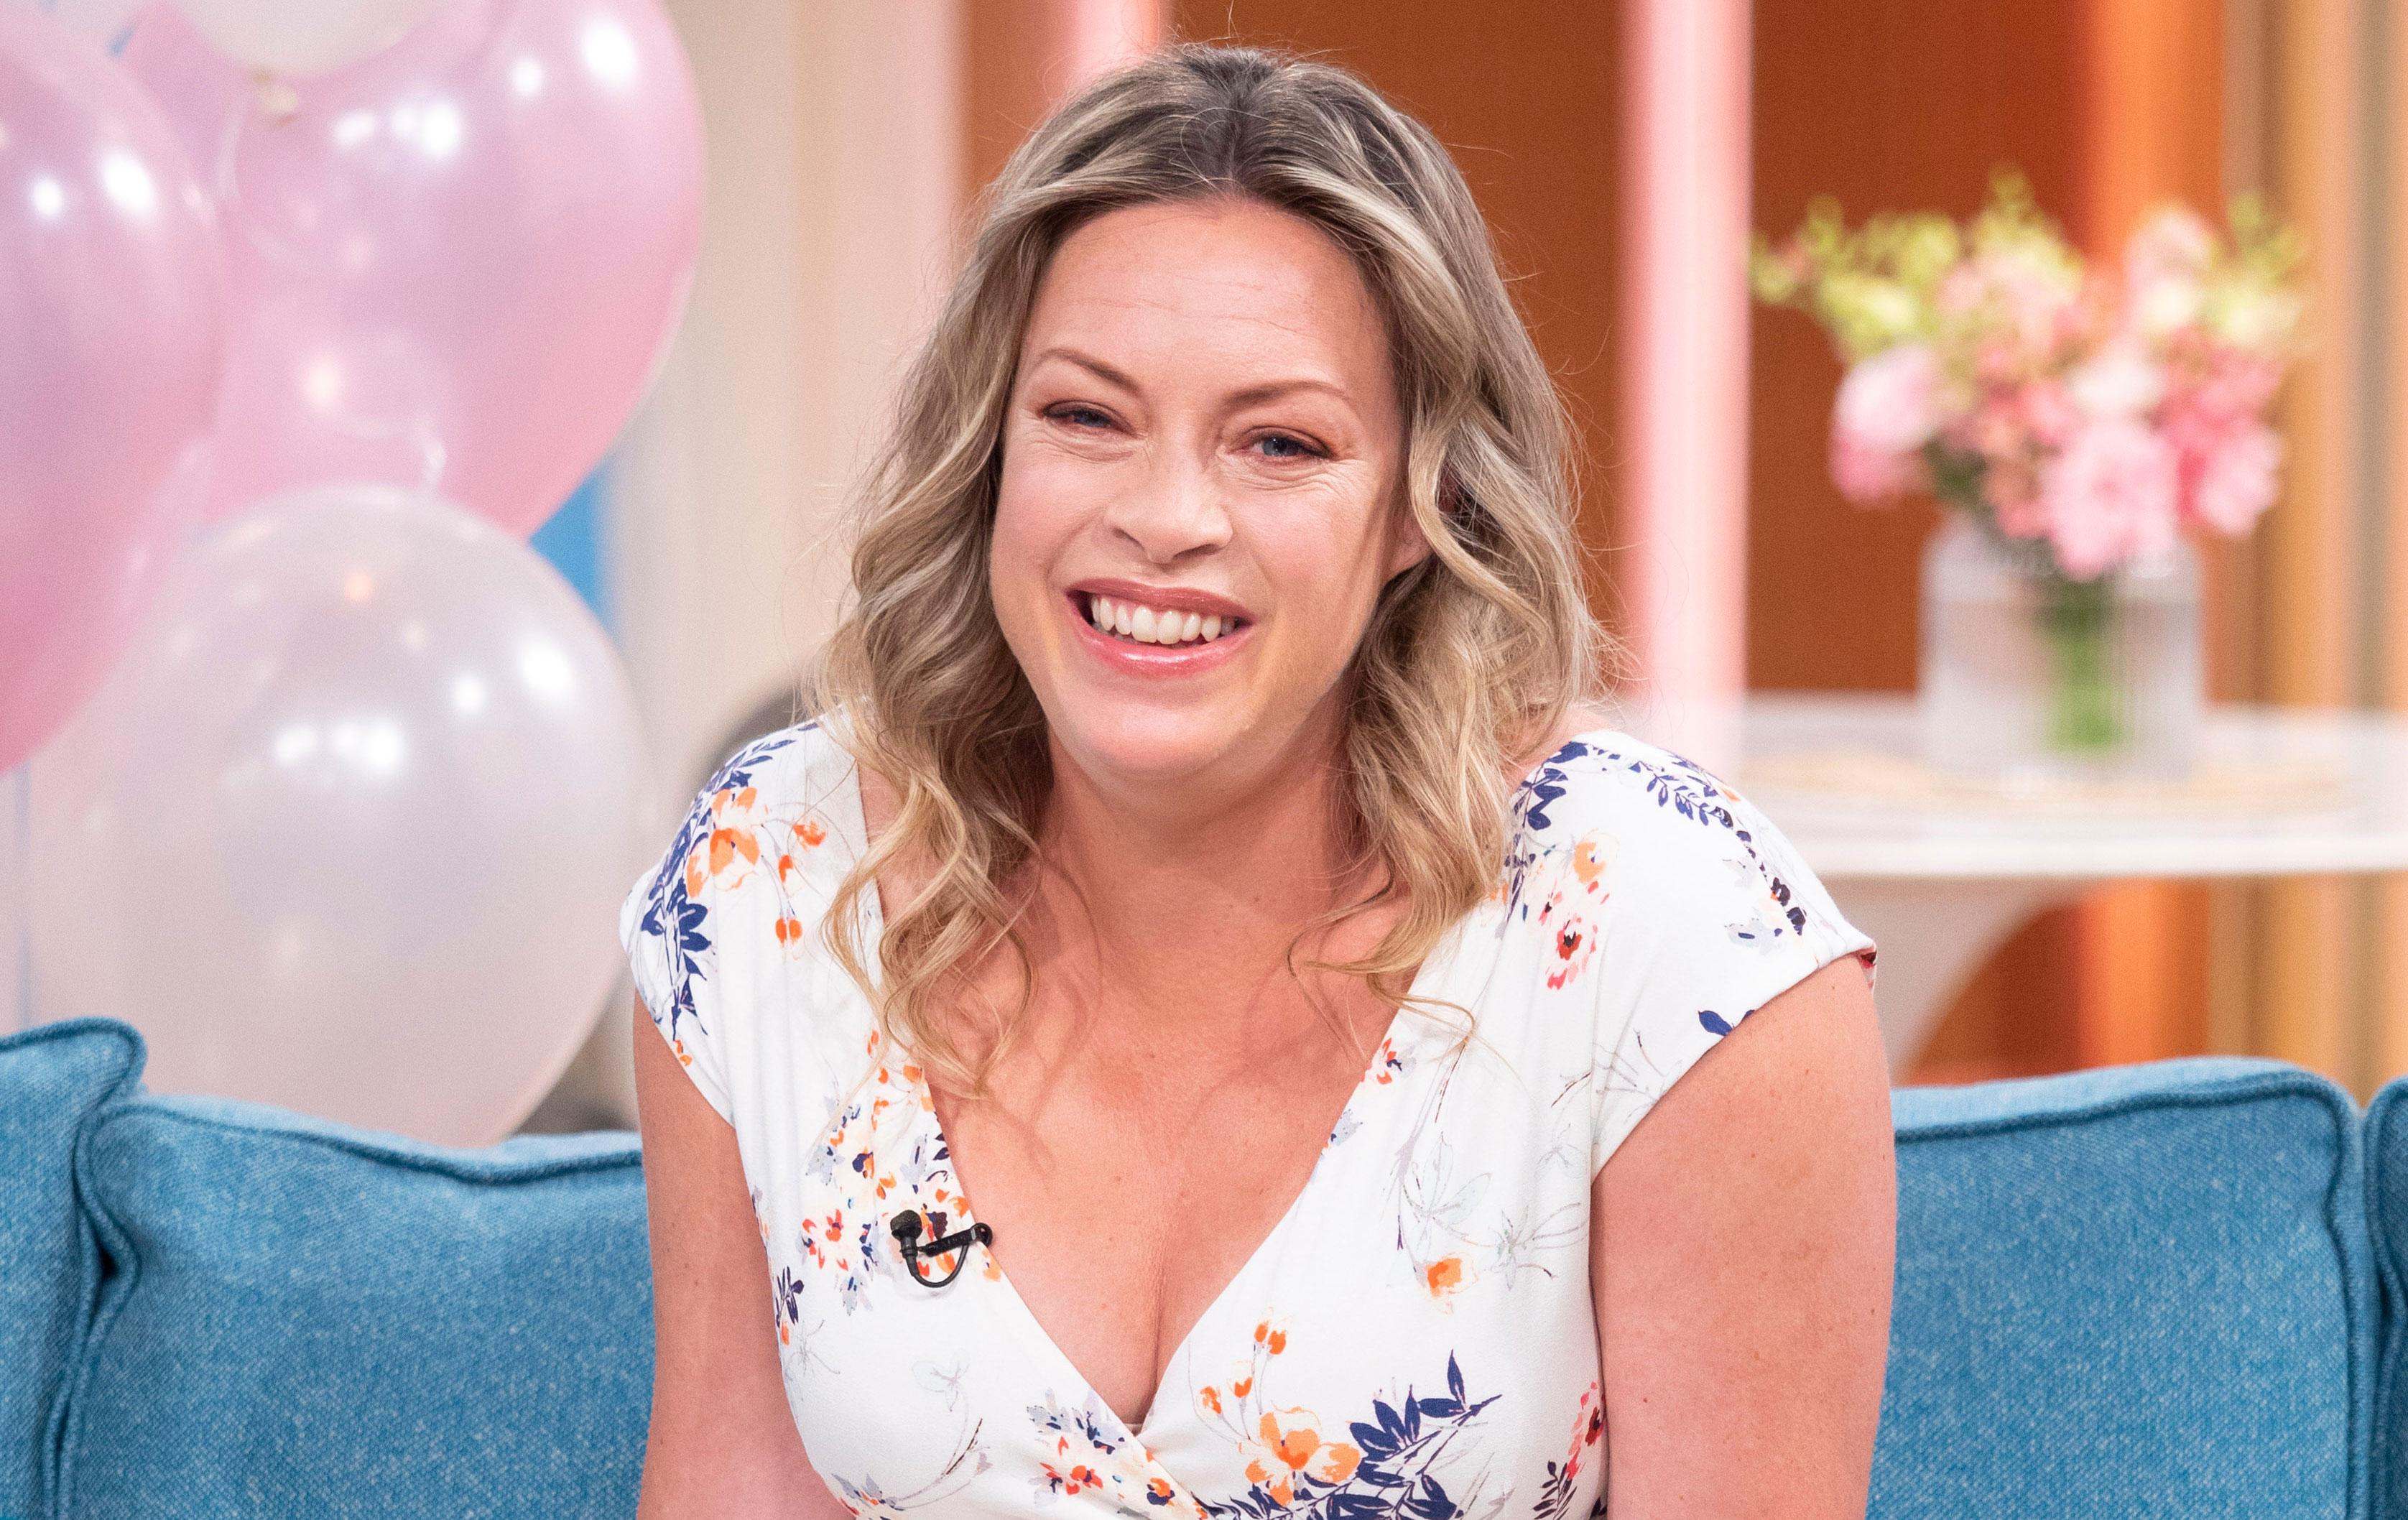 Sharon Marshall Has Given Birth And Reveals Adorable Name